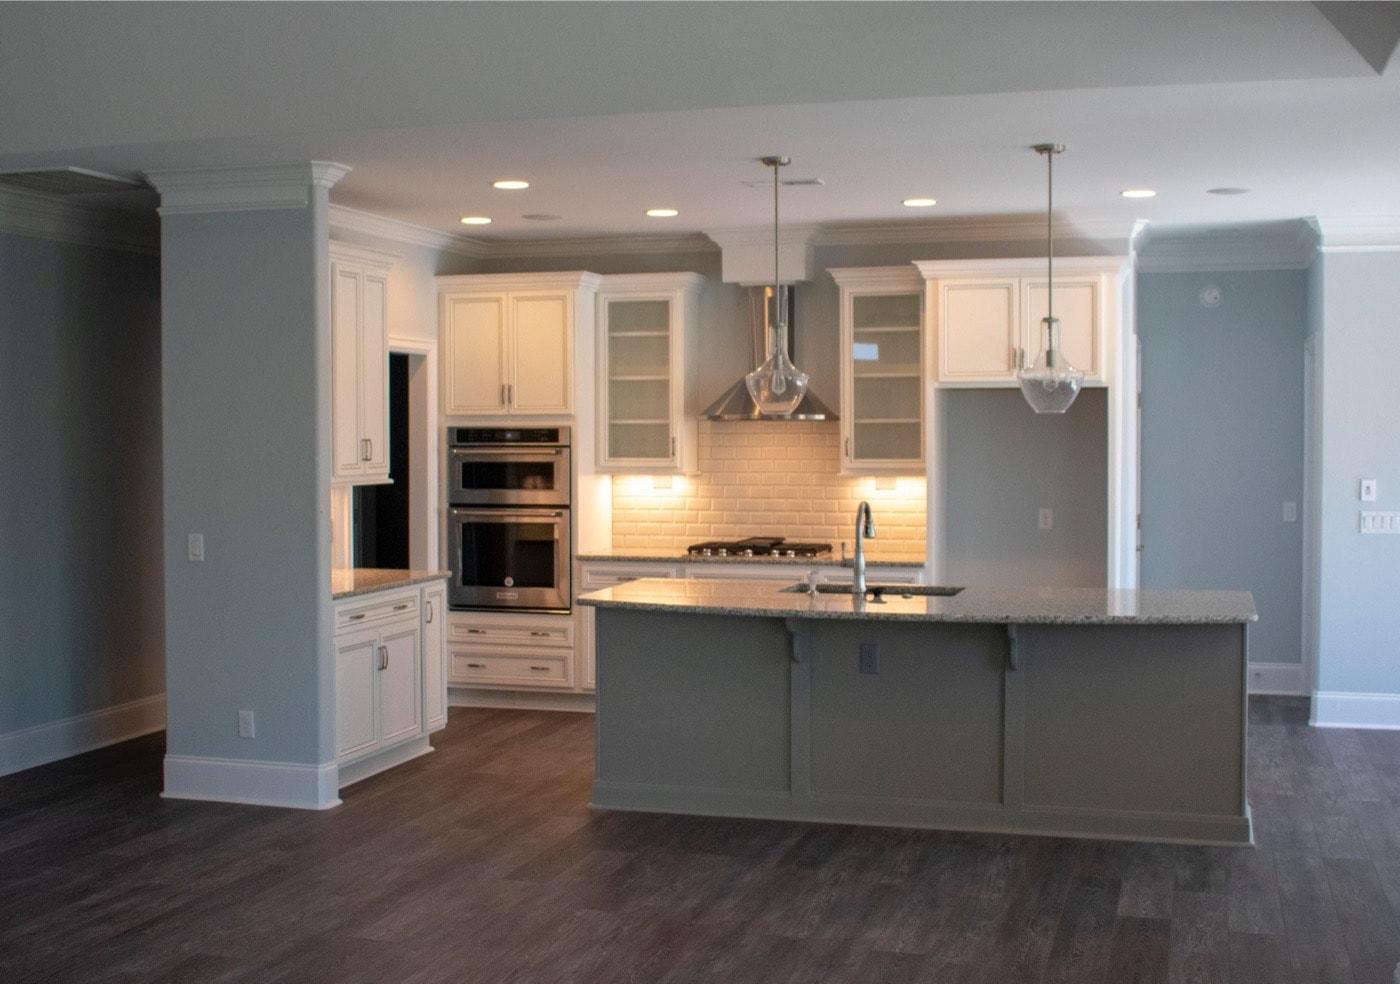 BF kitchen_res (3)